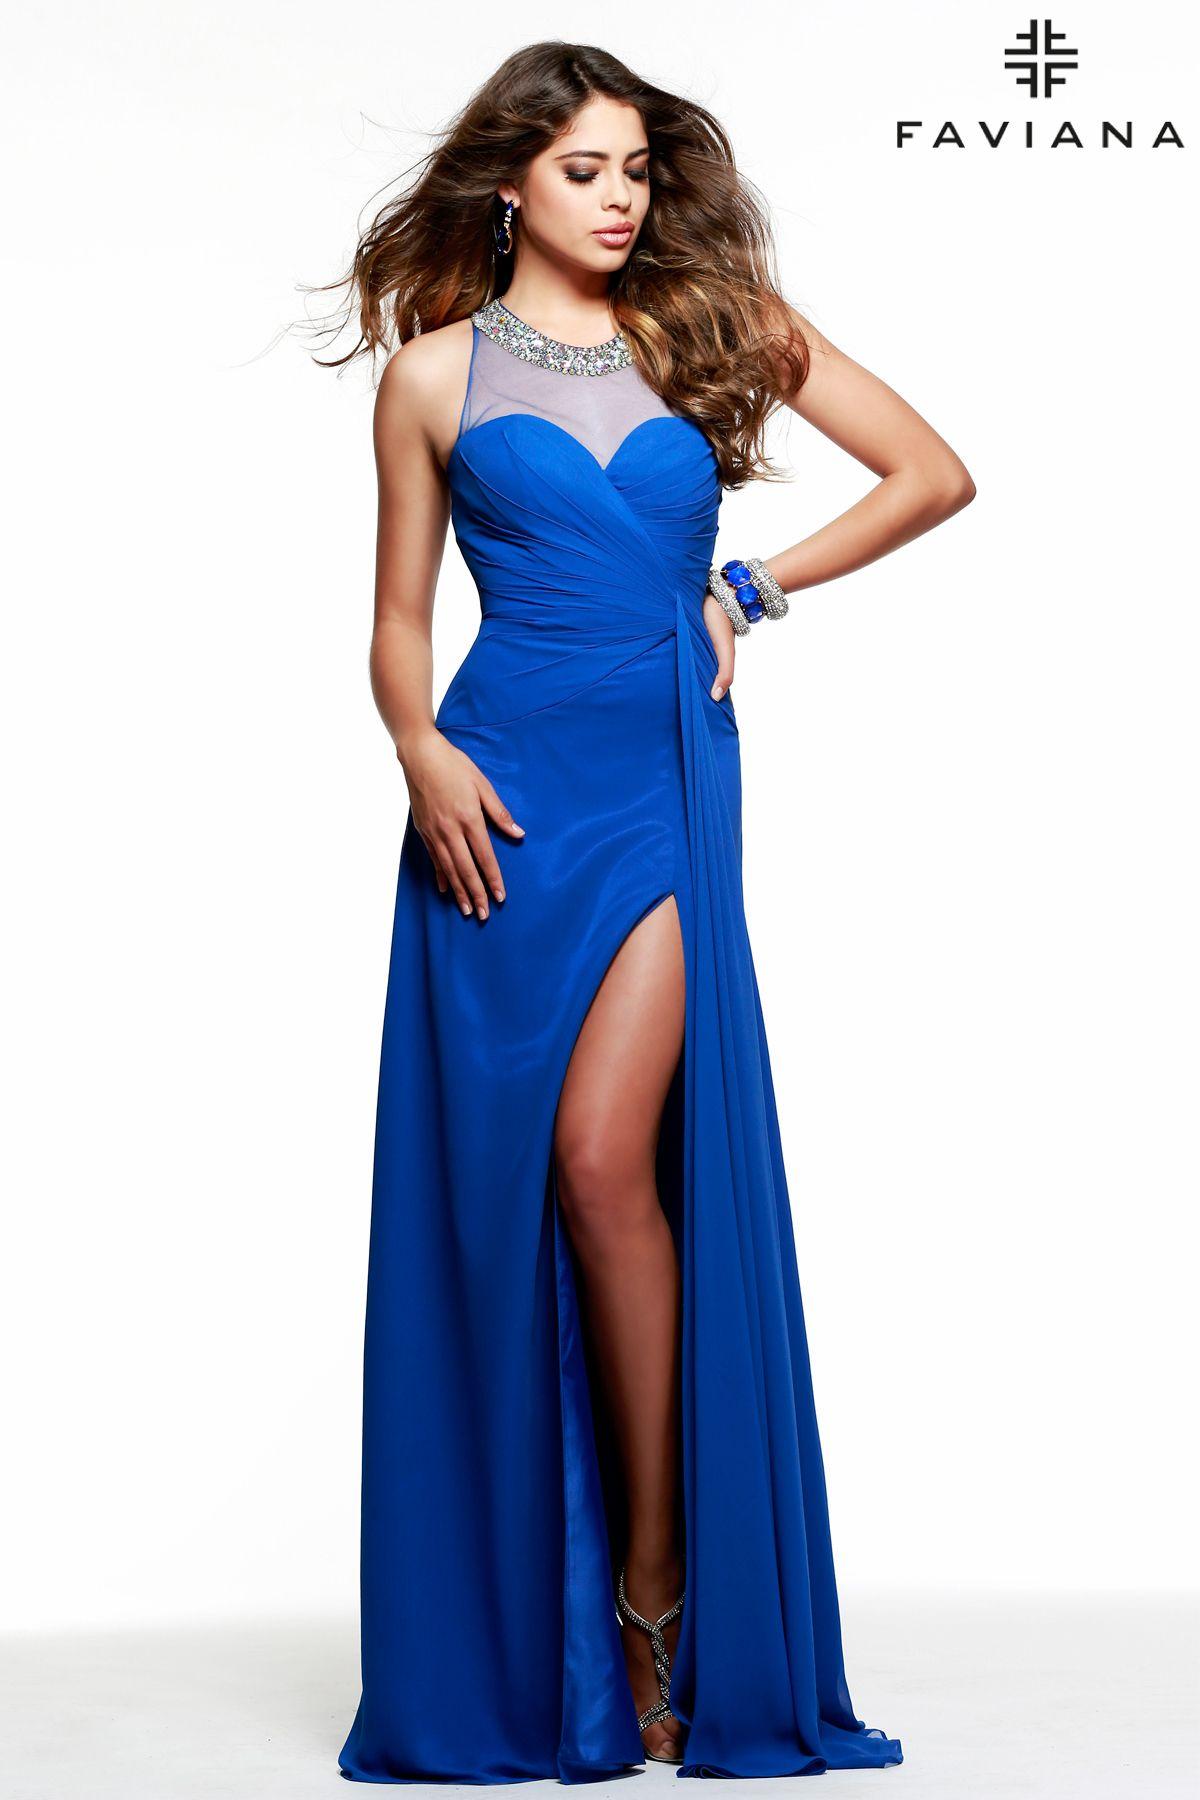 Elizabeth dresses pinterest royal blue bald hairstyles